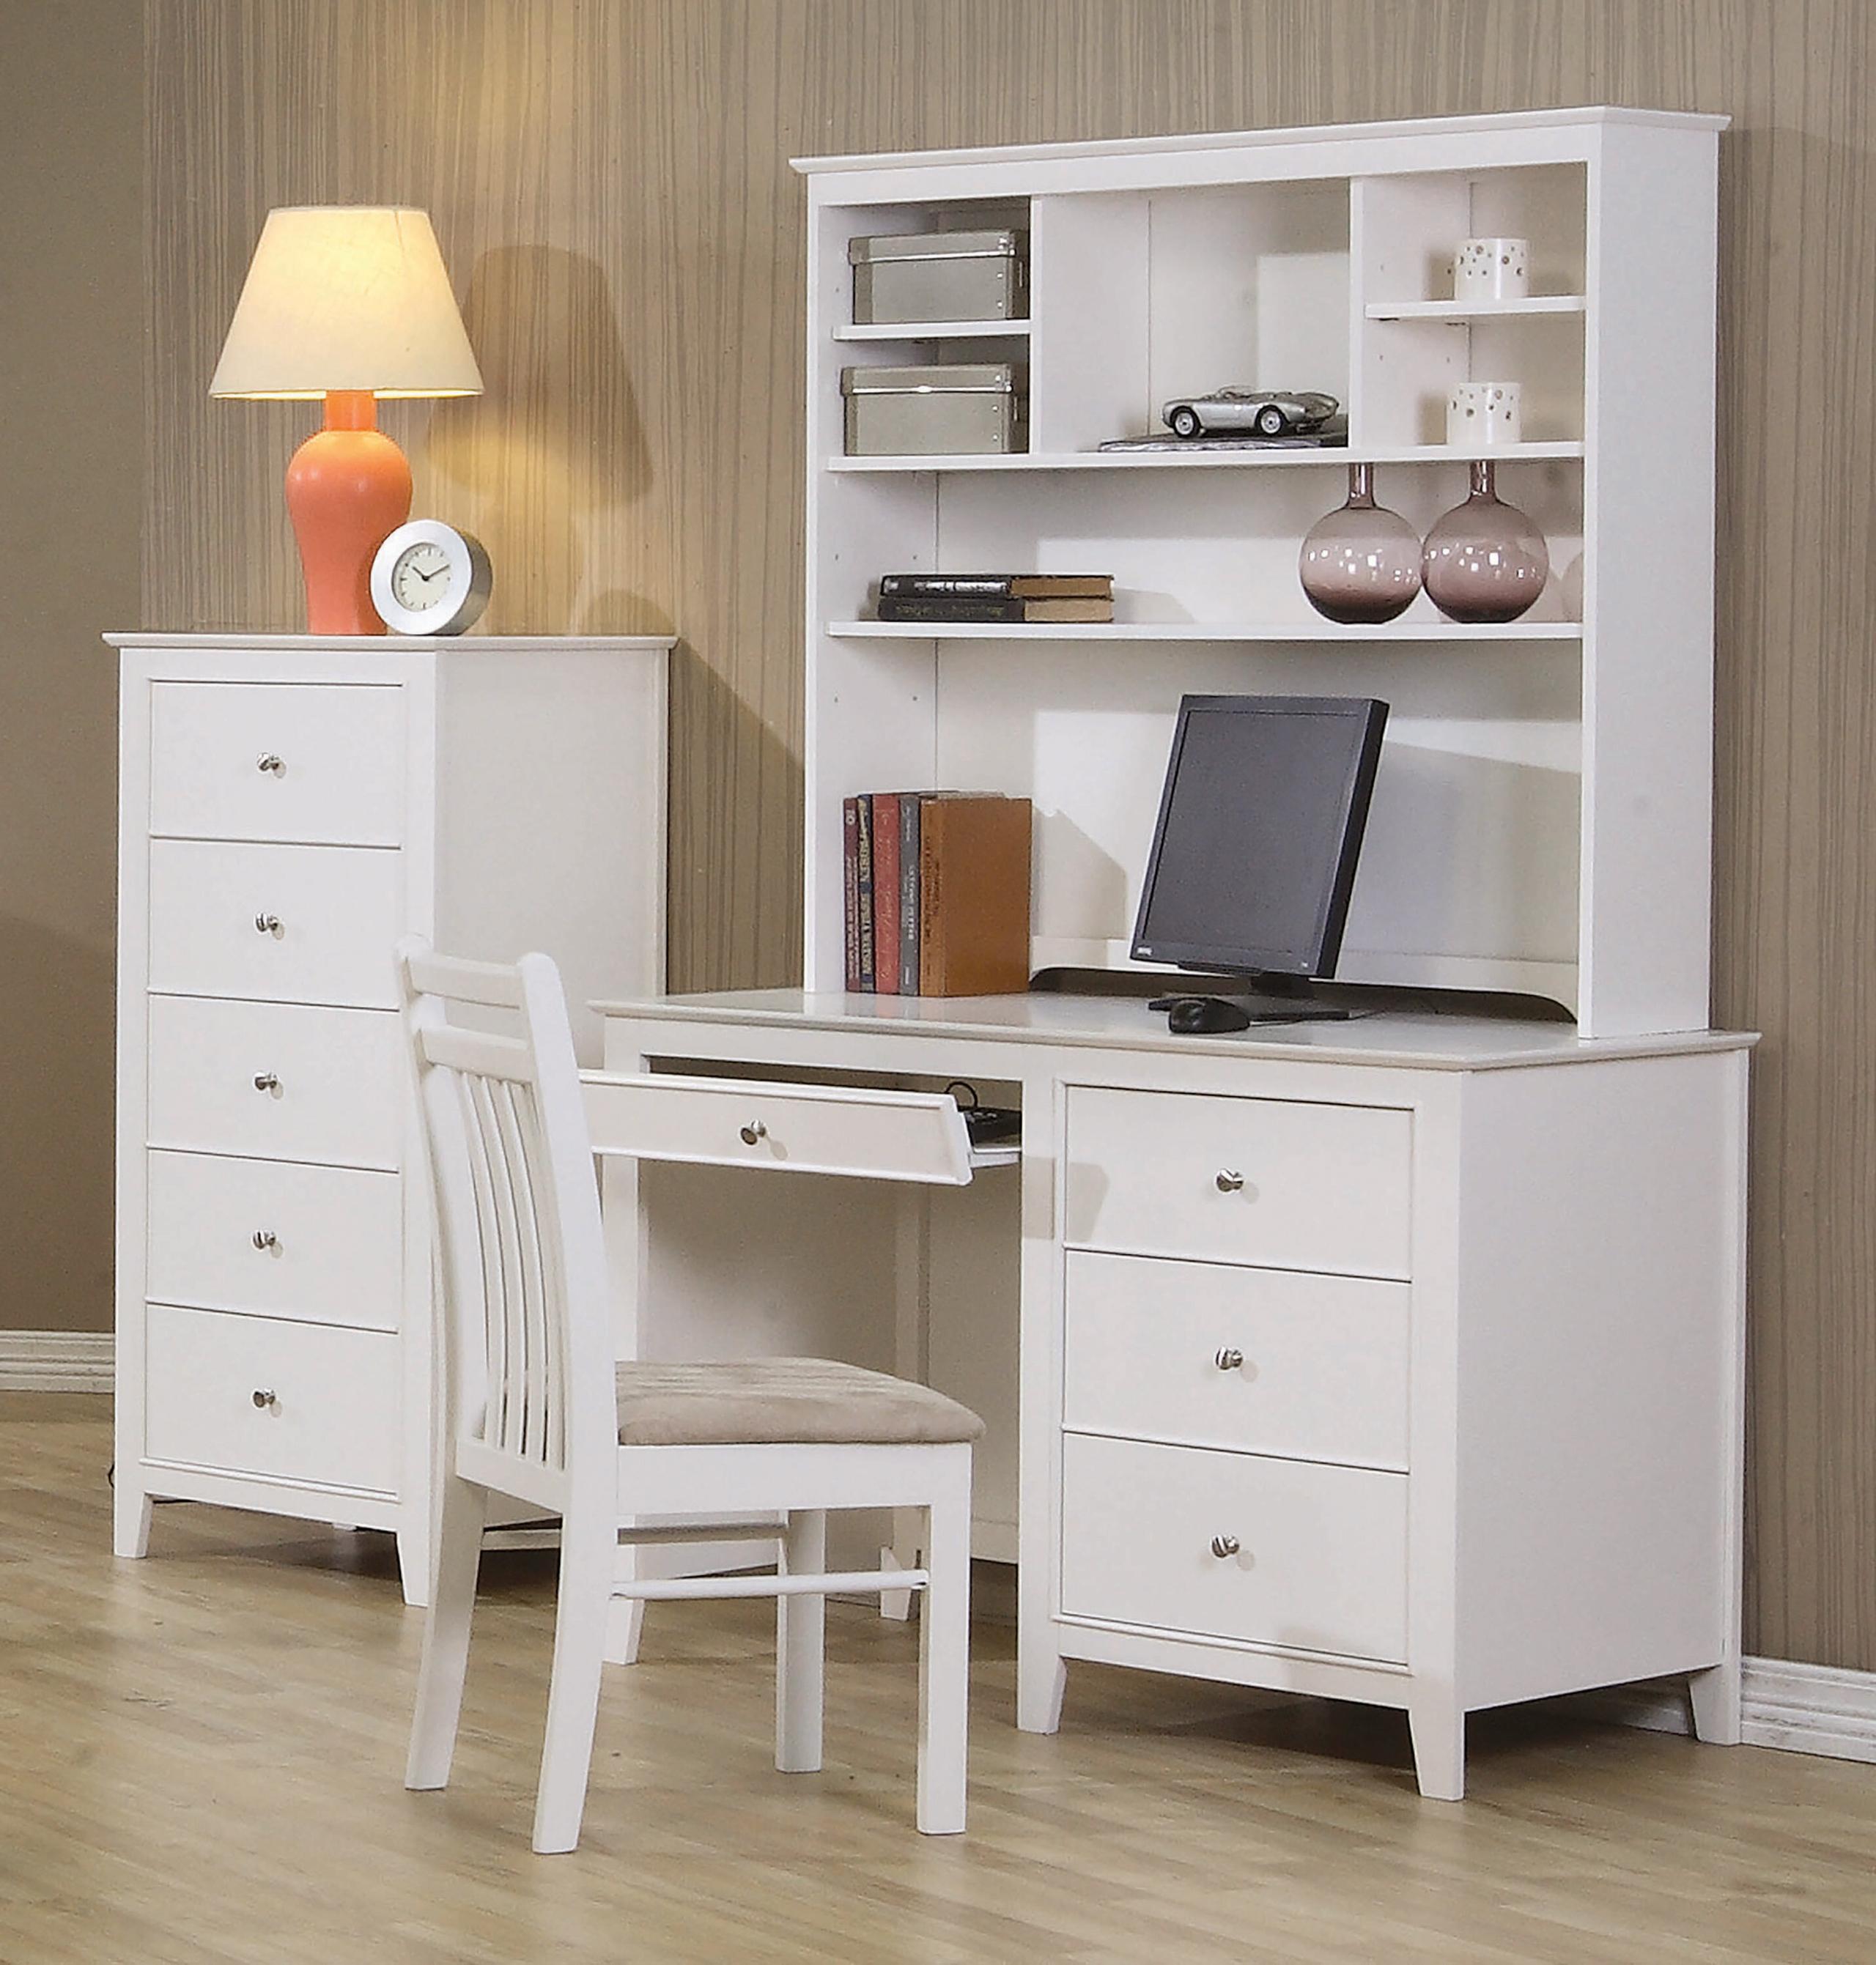 beadboard spacesaving desk hutch pbteen doll house cream floral rh r750explorer me girls white desks with hutch Inexpensive White Desks for Girls